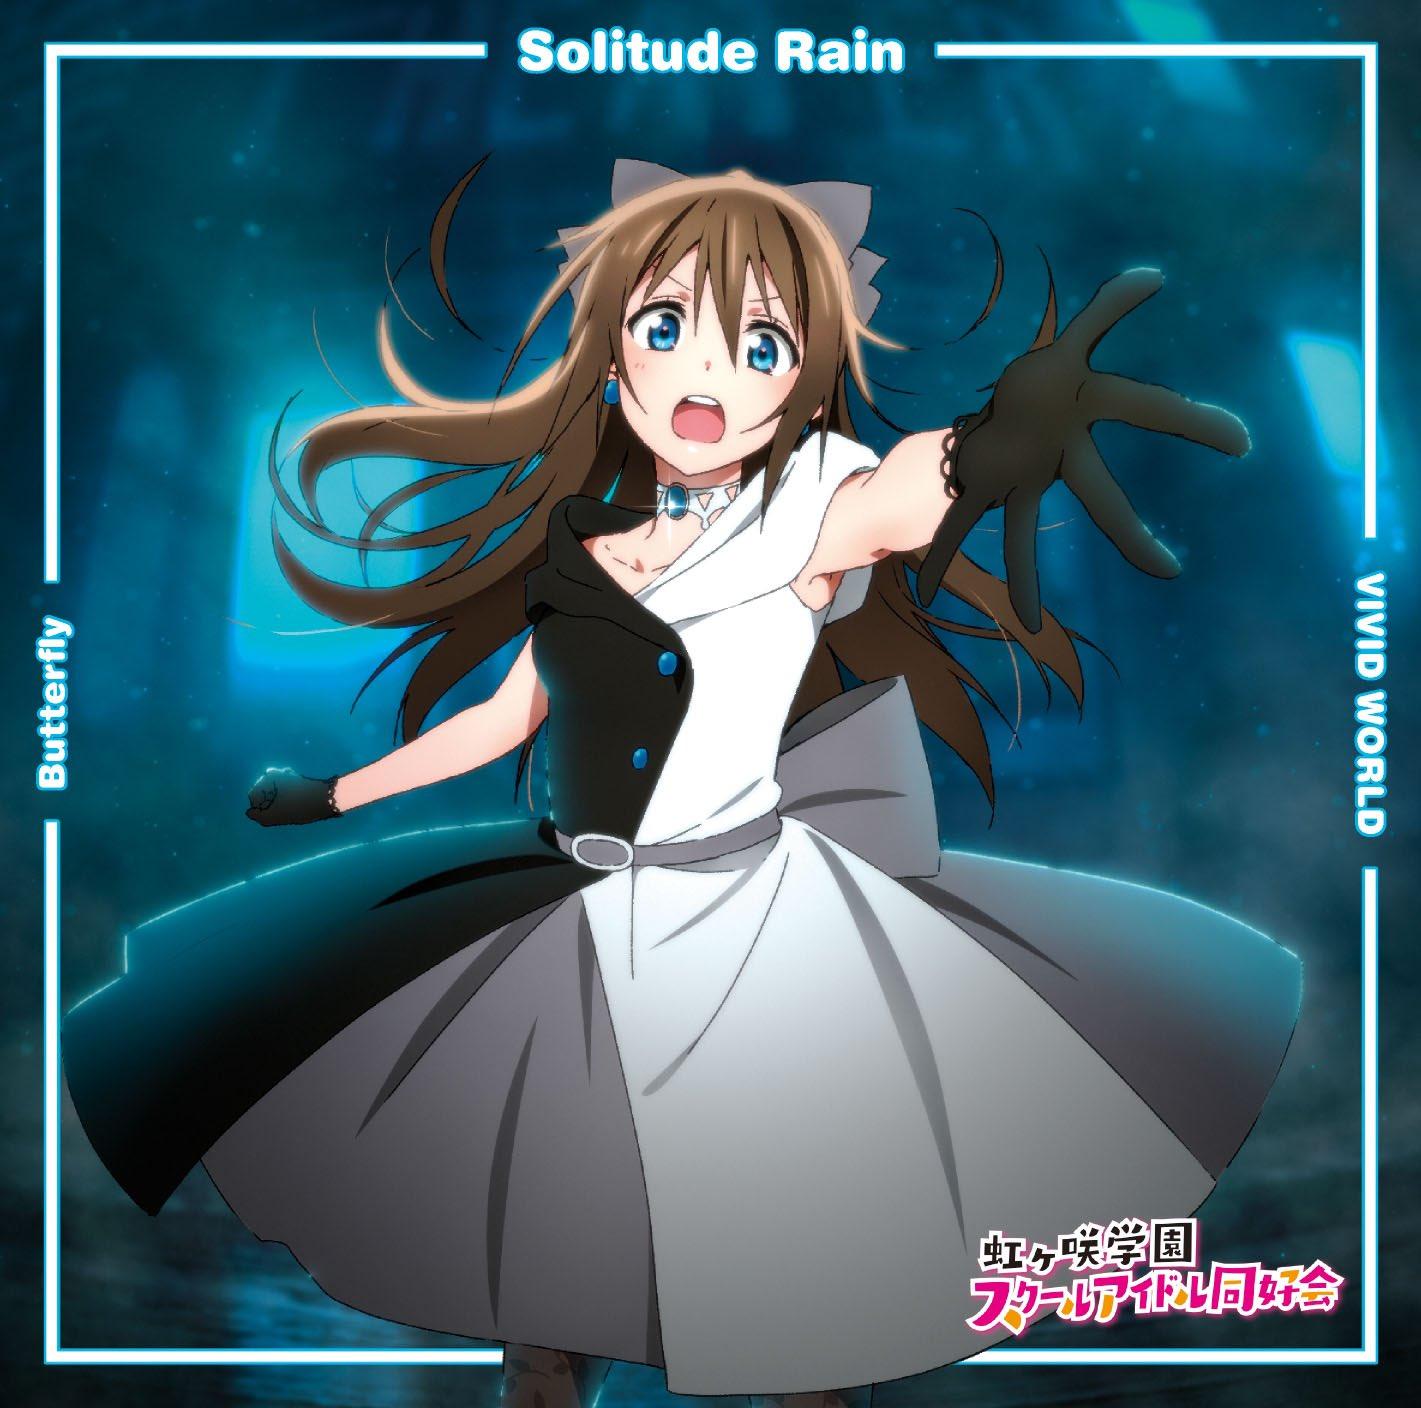 solitude rain shizuku osaka love live nijigasaki